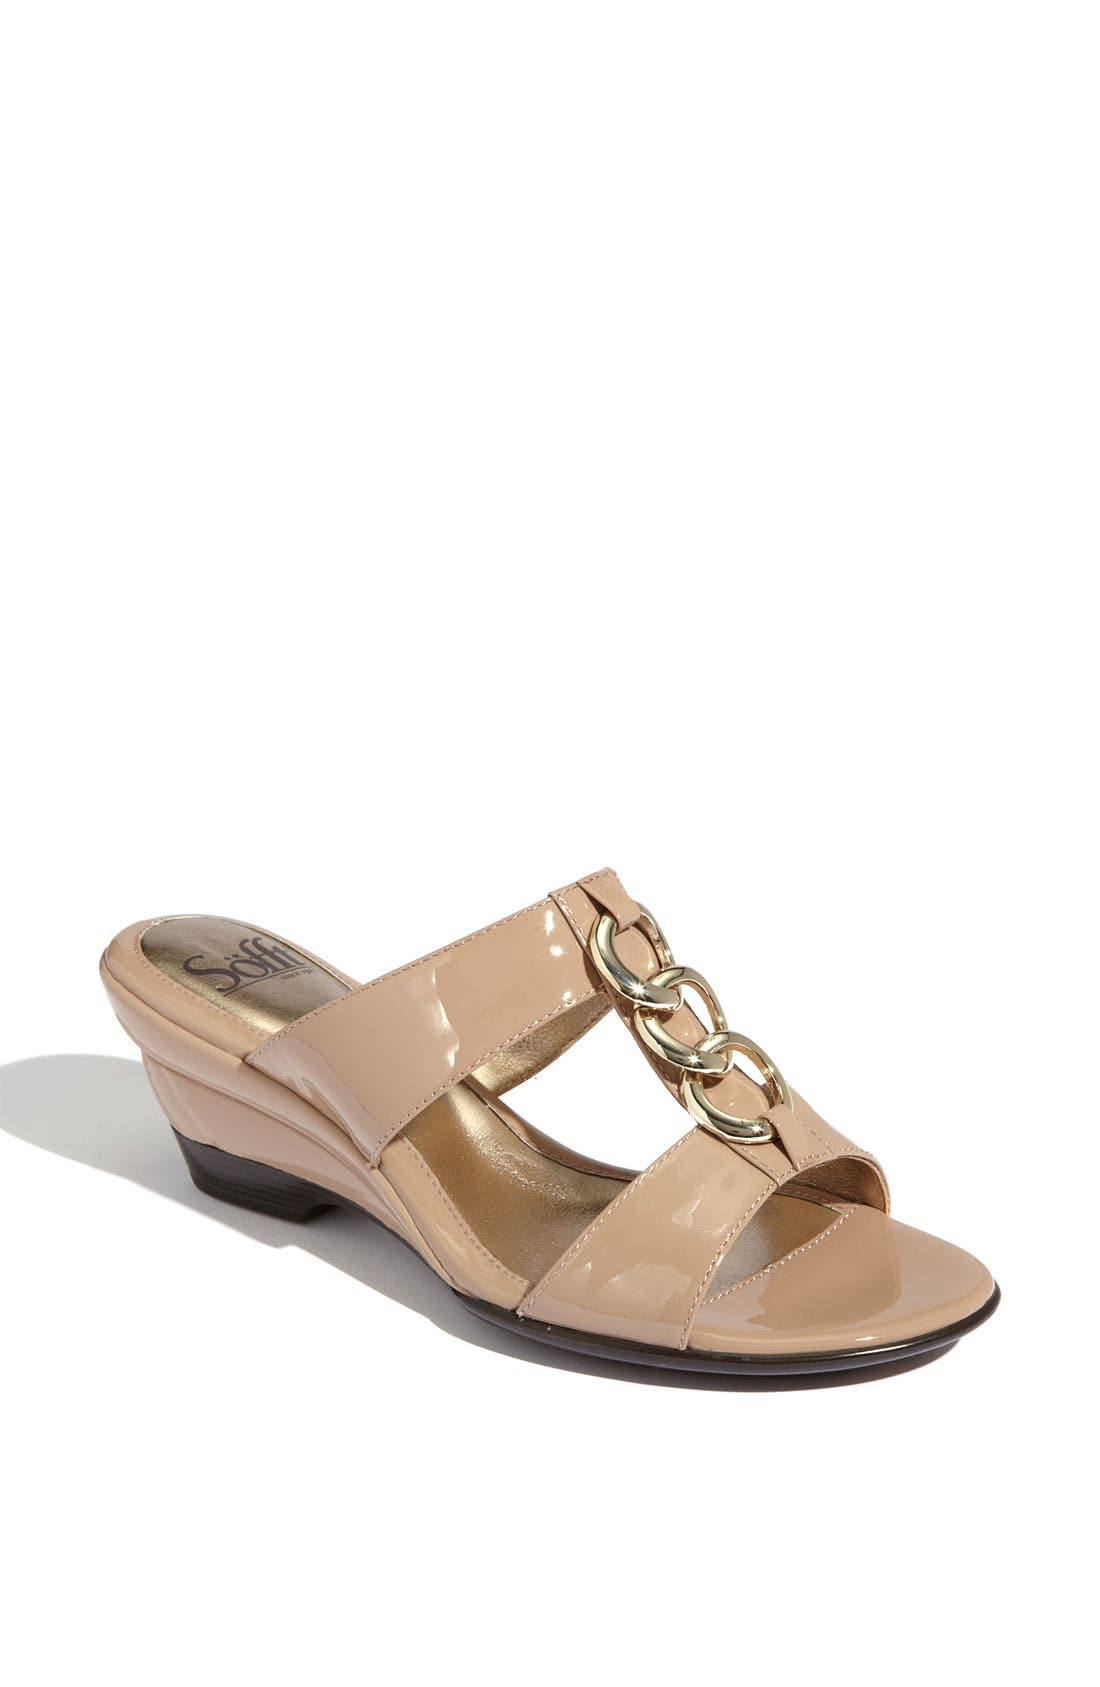 Main Image - Söfft 'Ibiza' Sandal